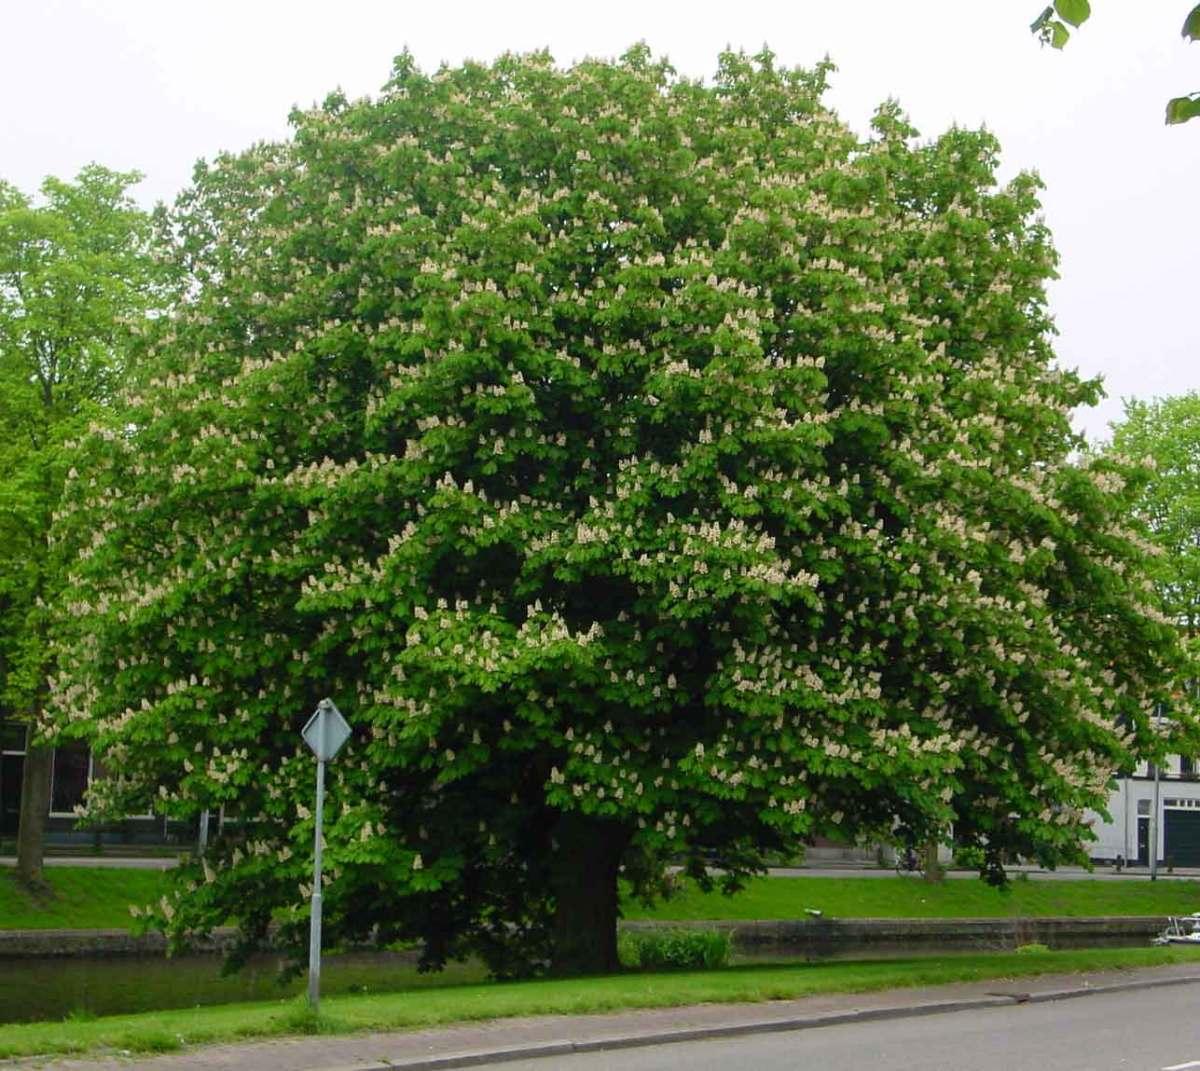 Horse chestnut tree.